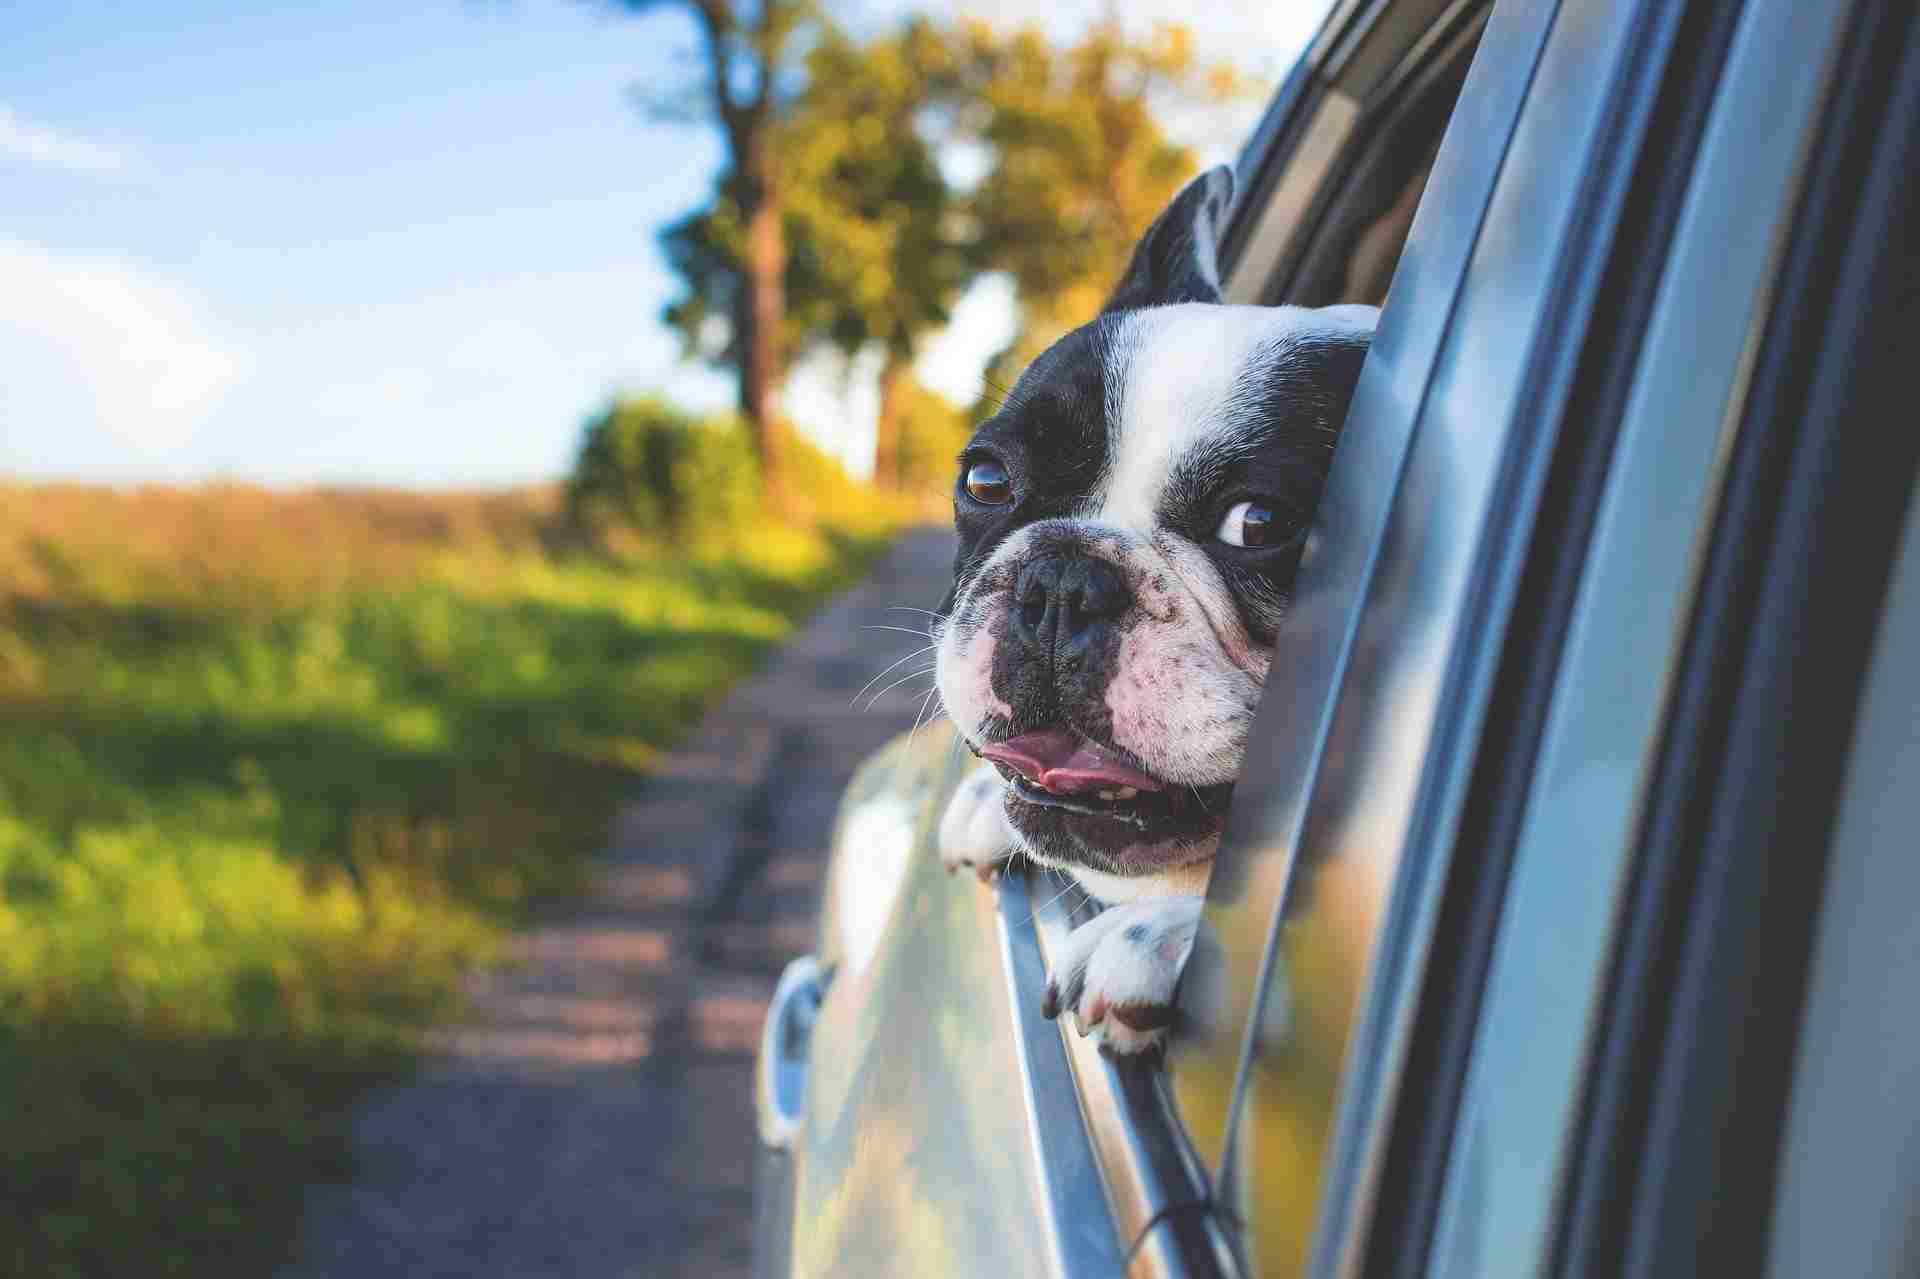 Cane riceve soffio naso